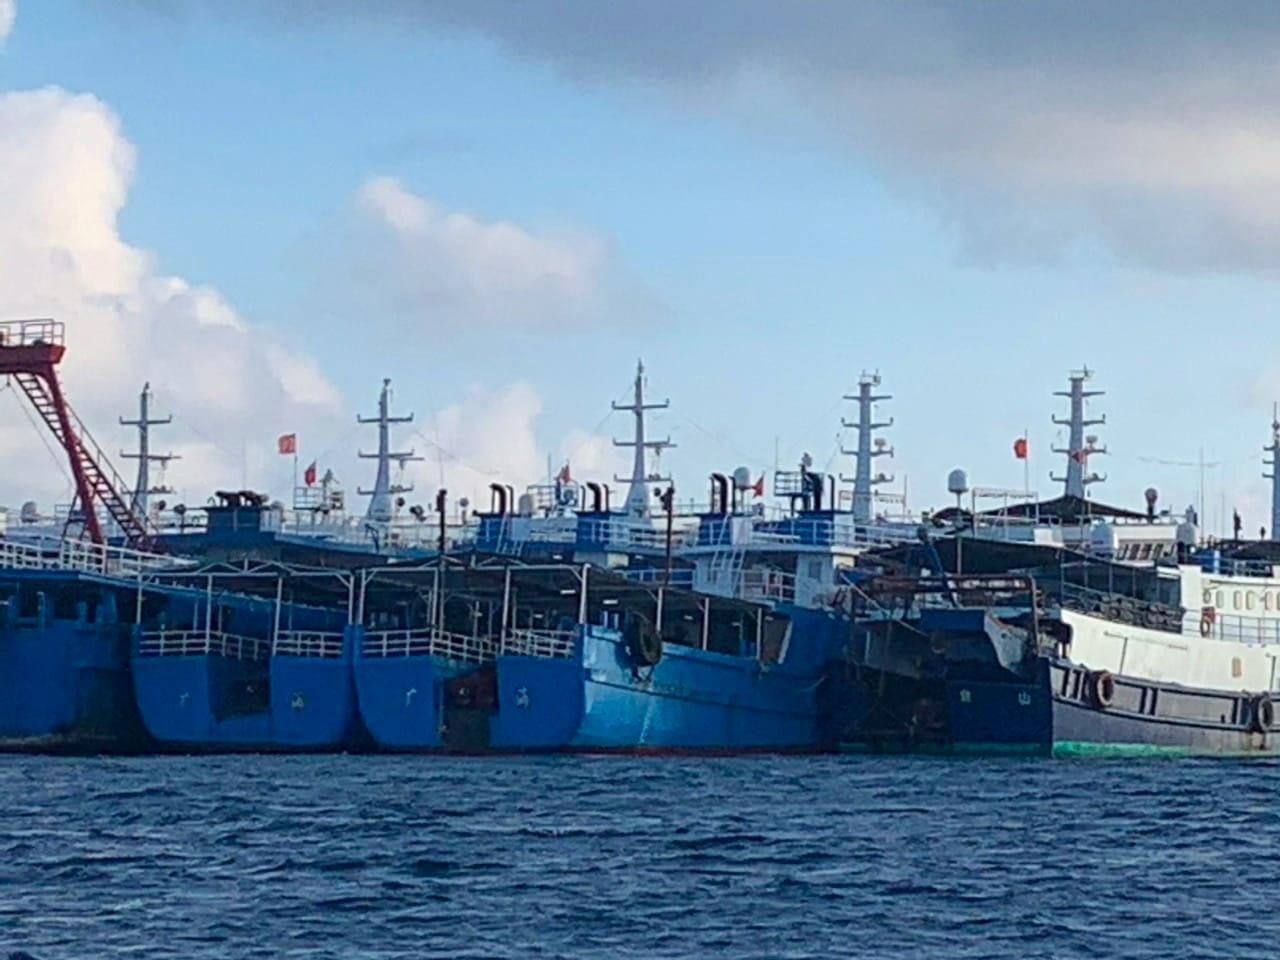 _PHILIPPINES-CHINA-SOUTHCHINASEA - Whitsun Reef